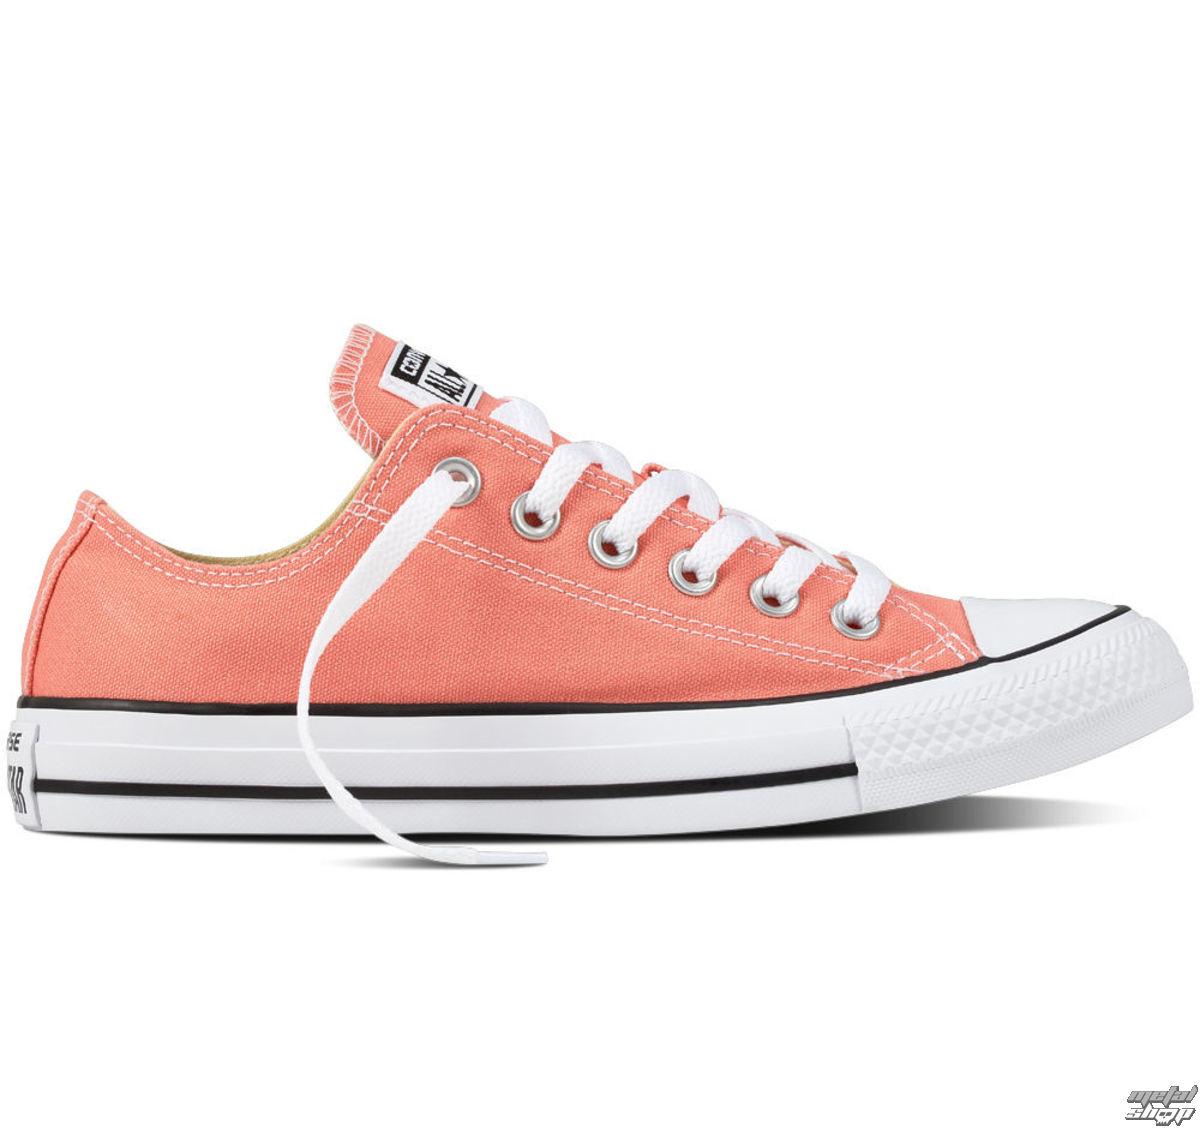 rövidszárú cipő női - CONVERSE - C157645 - Metalshop.hu 6b6a3c8a62